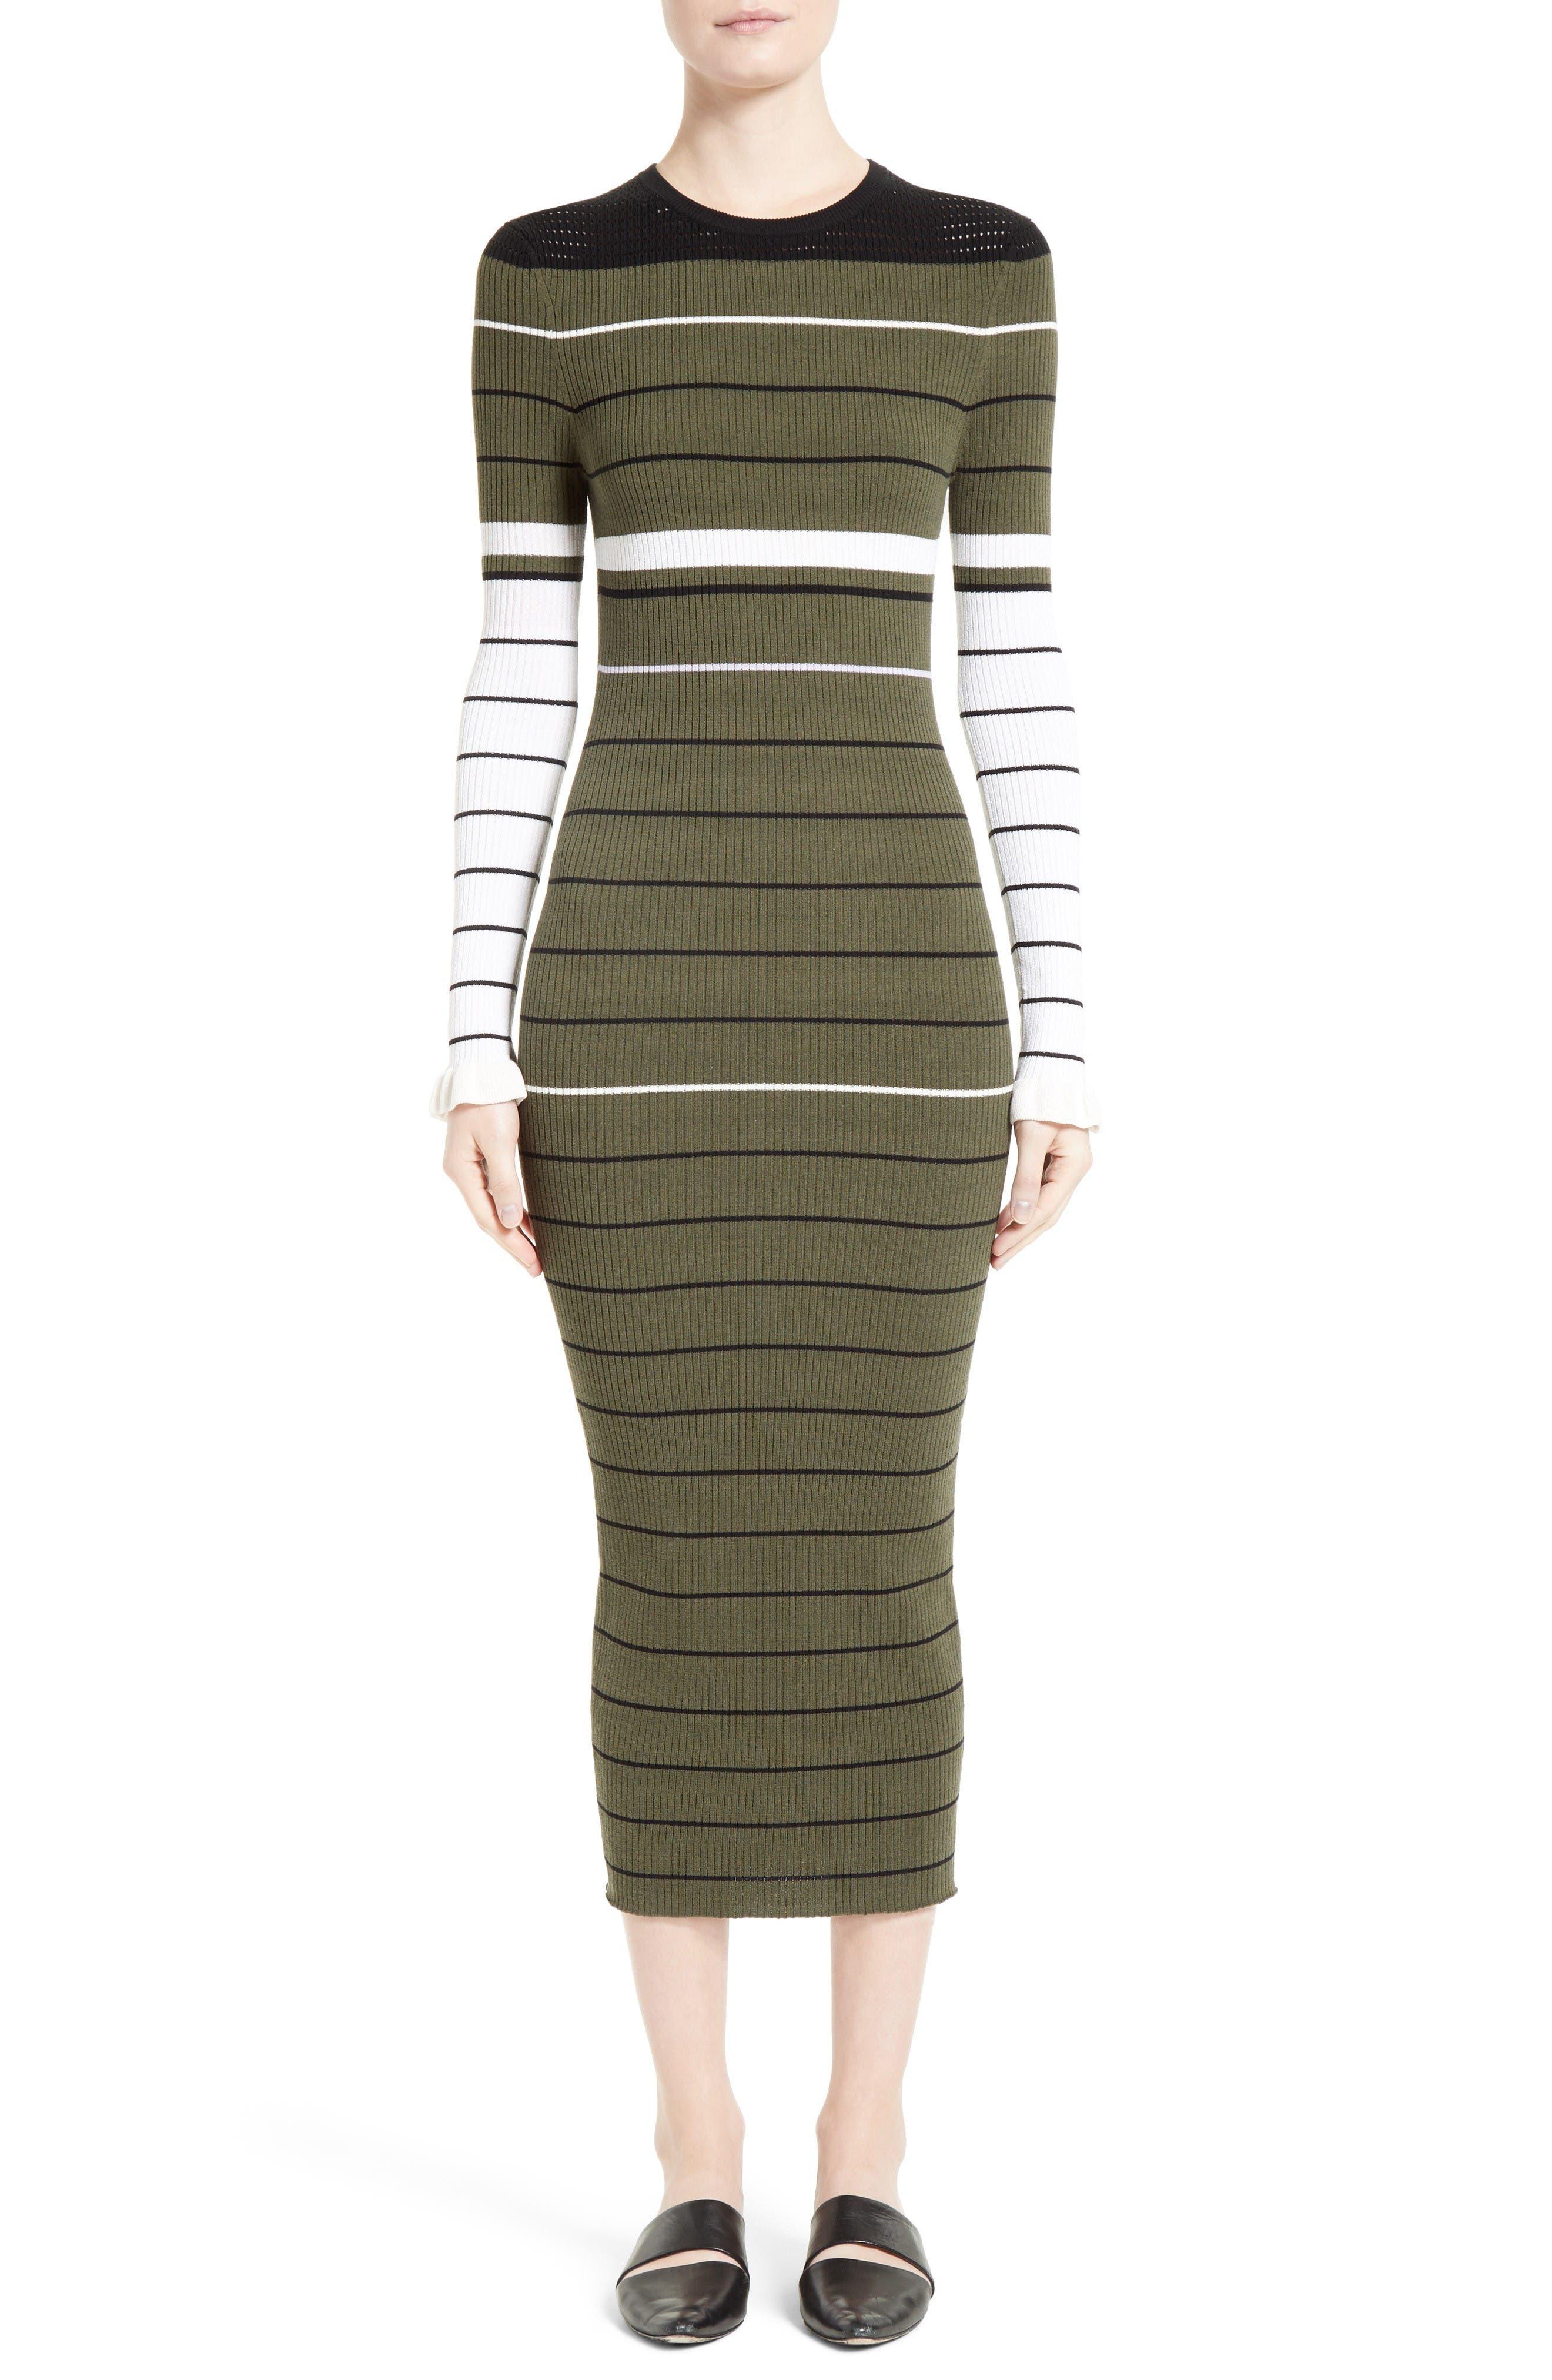 Alternate Image 1 Selected - Opening Ceremony Stripe Rib Knit Dress